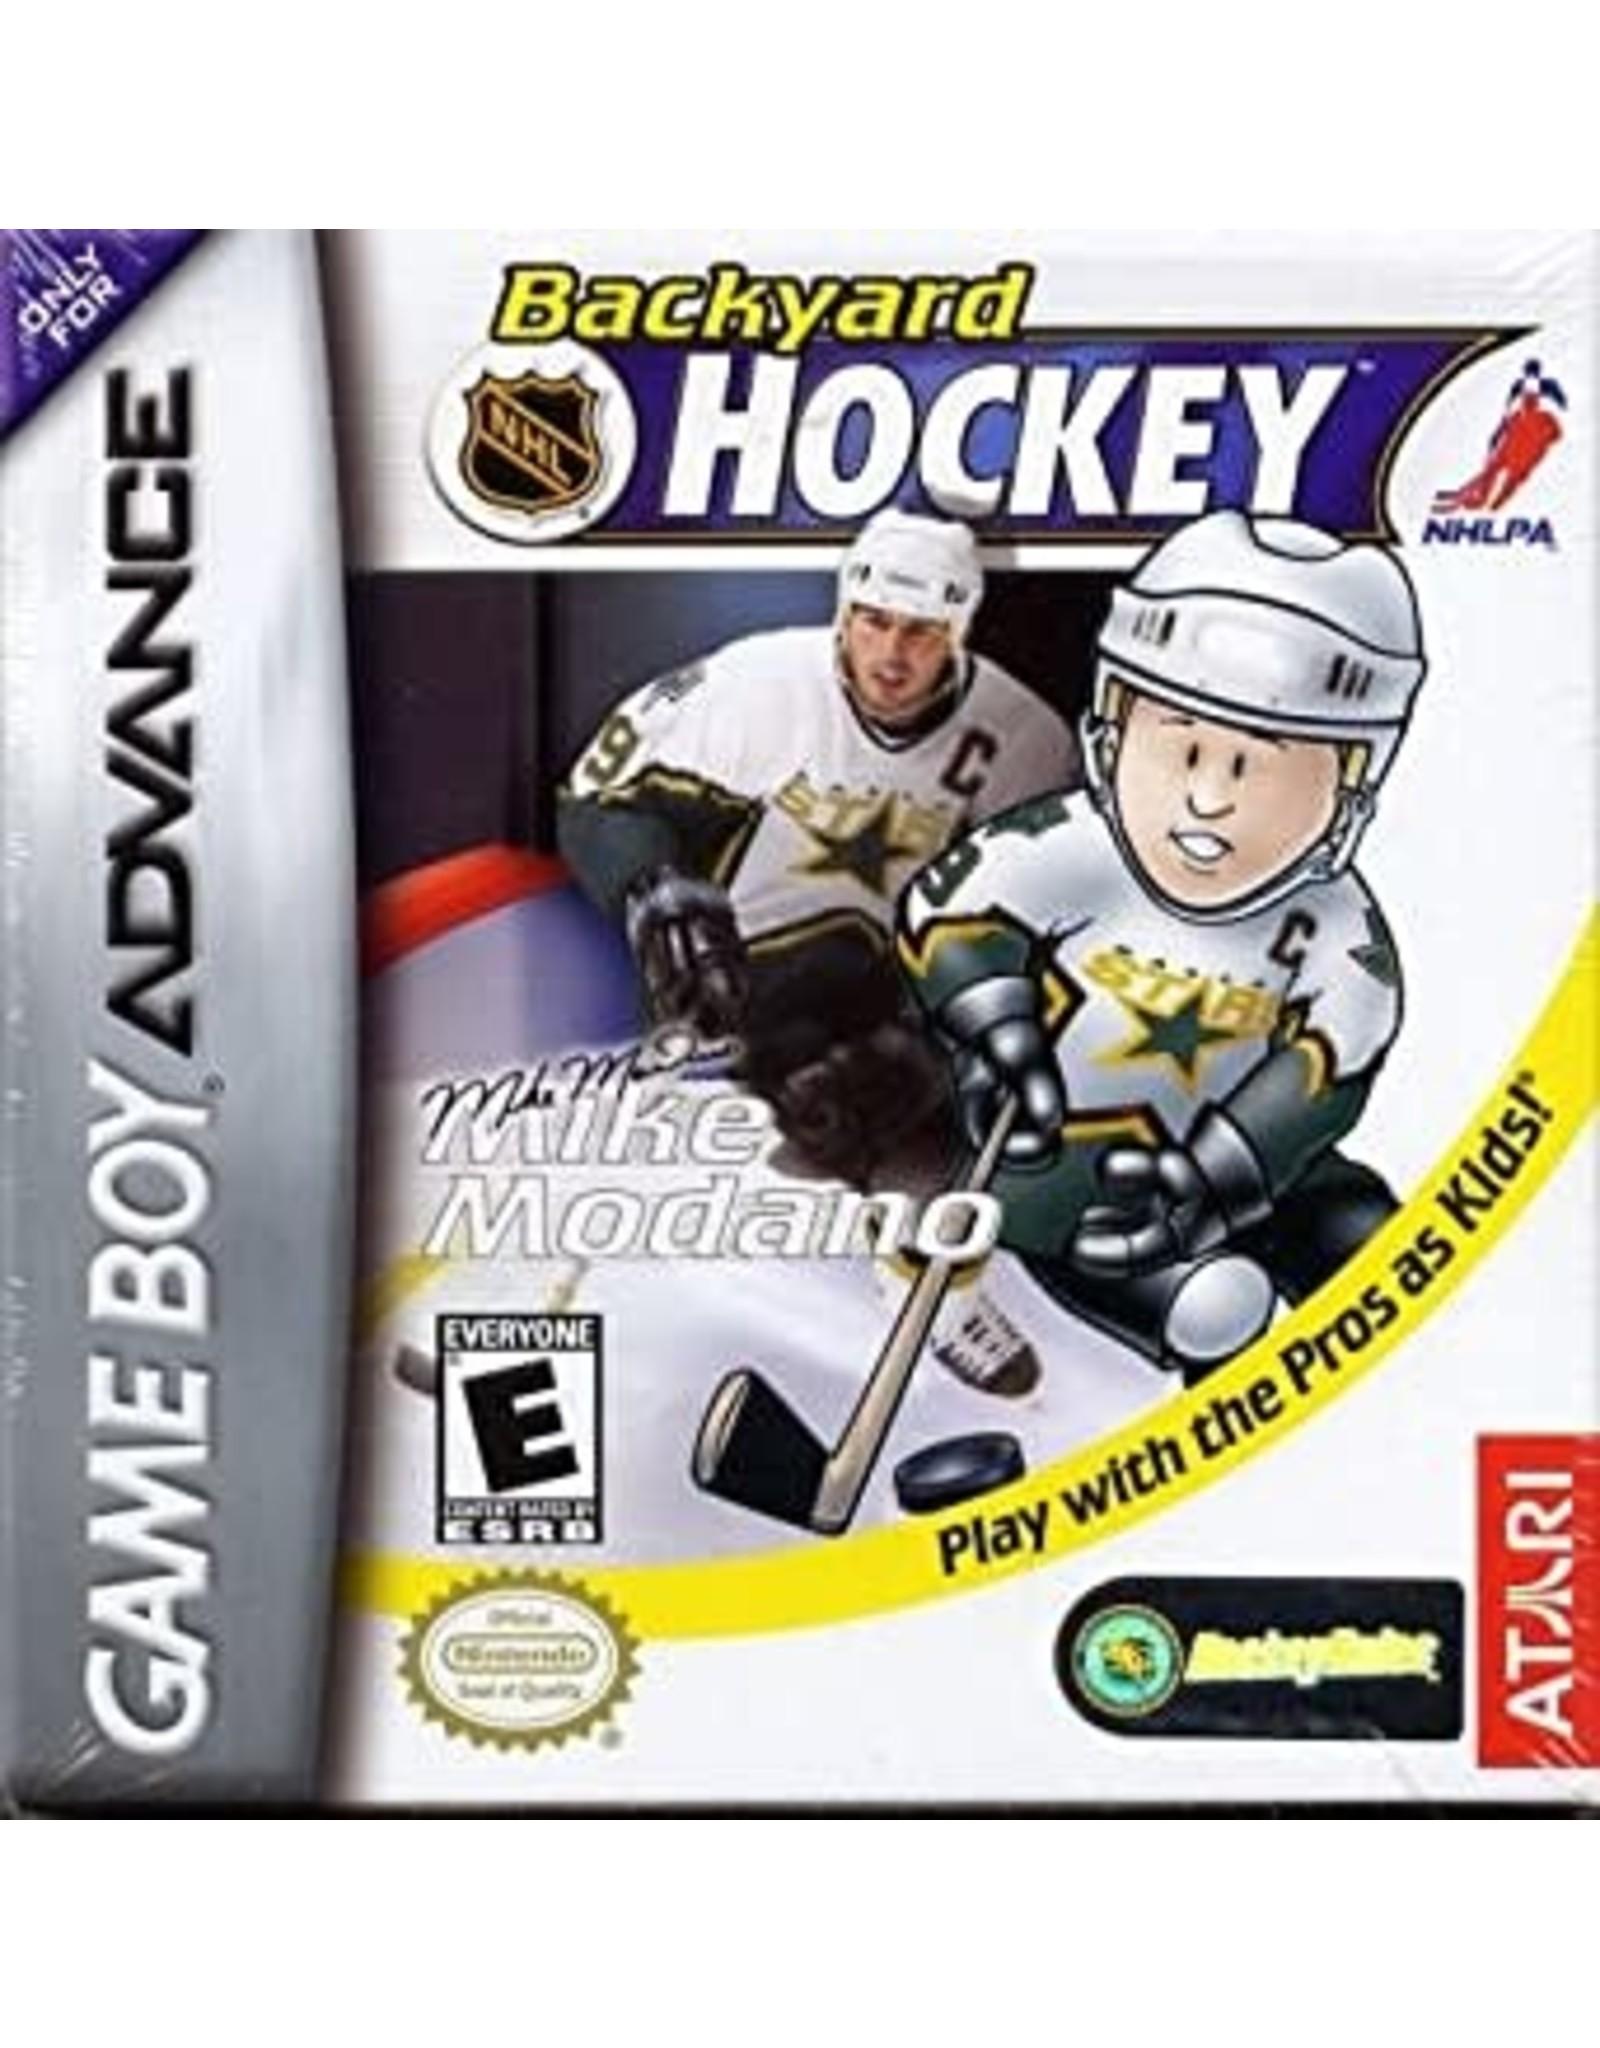 GameBoy Advance Backyard Hockey (CiB)